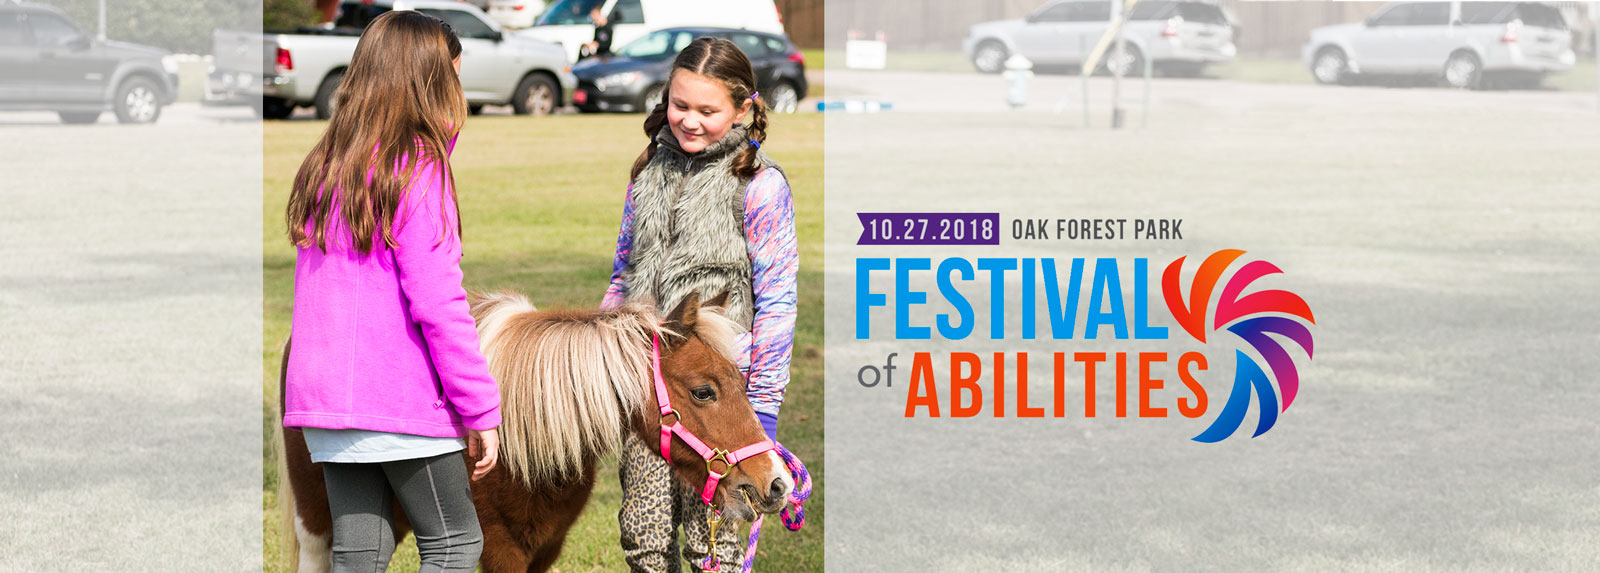 Festival of Abilities